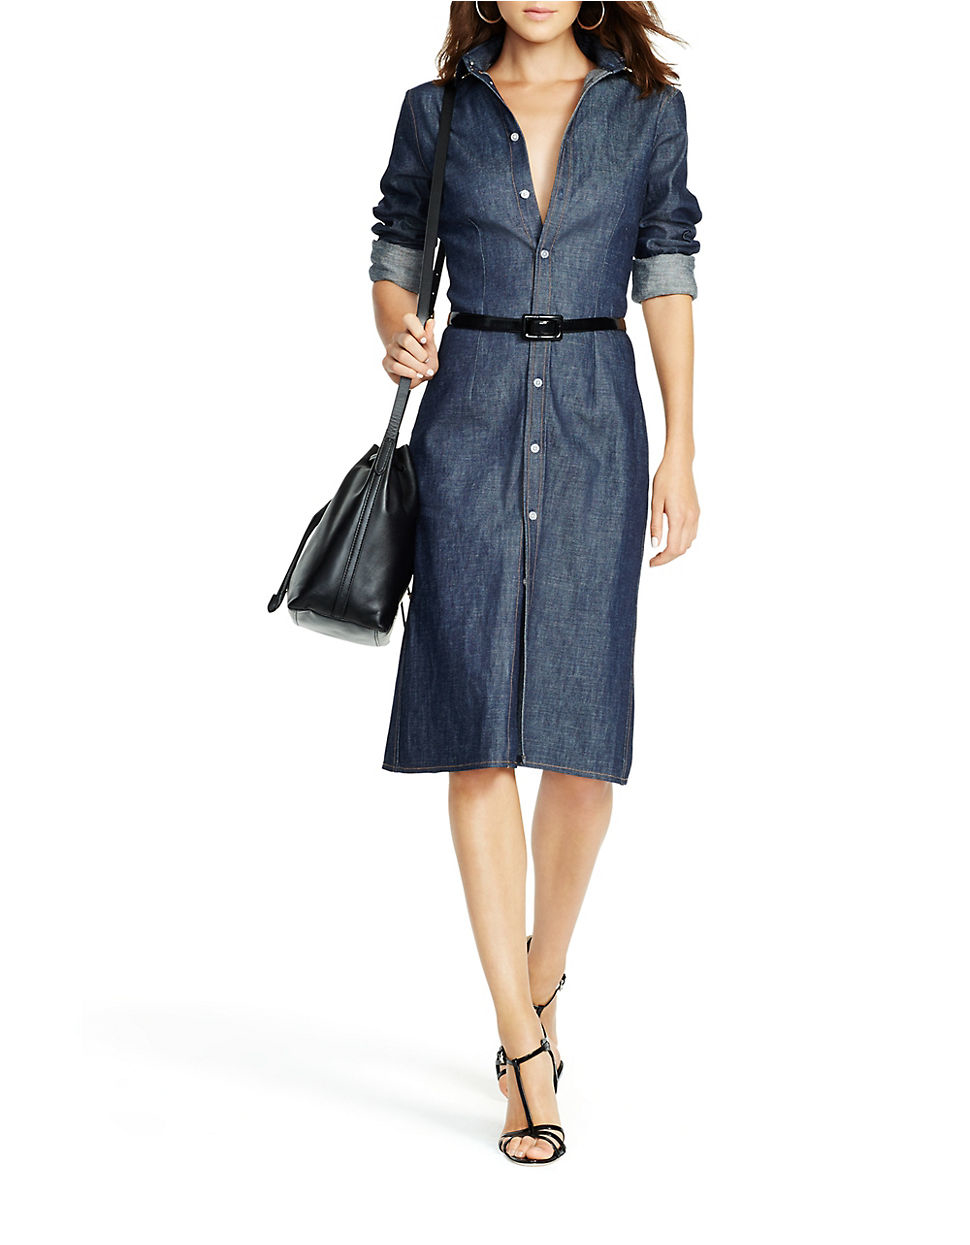 Lyst polo ralph lauren denim button down shirtdress in blue for Robe chemise ralph lauren